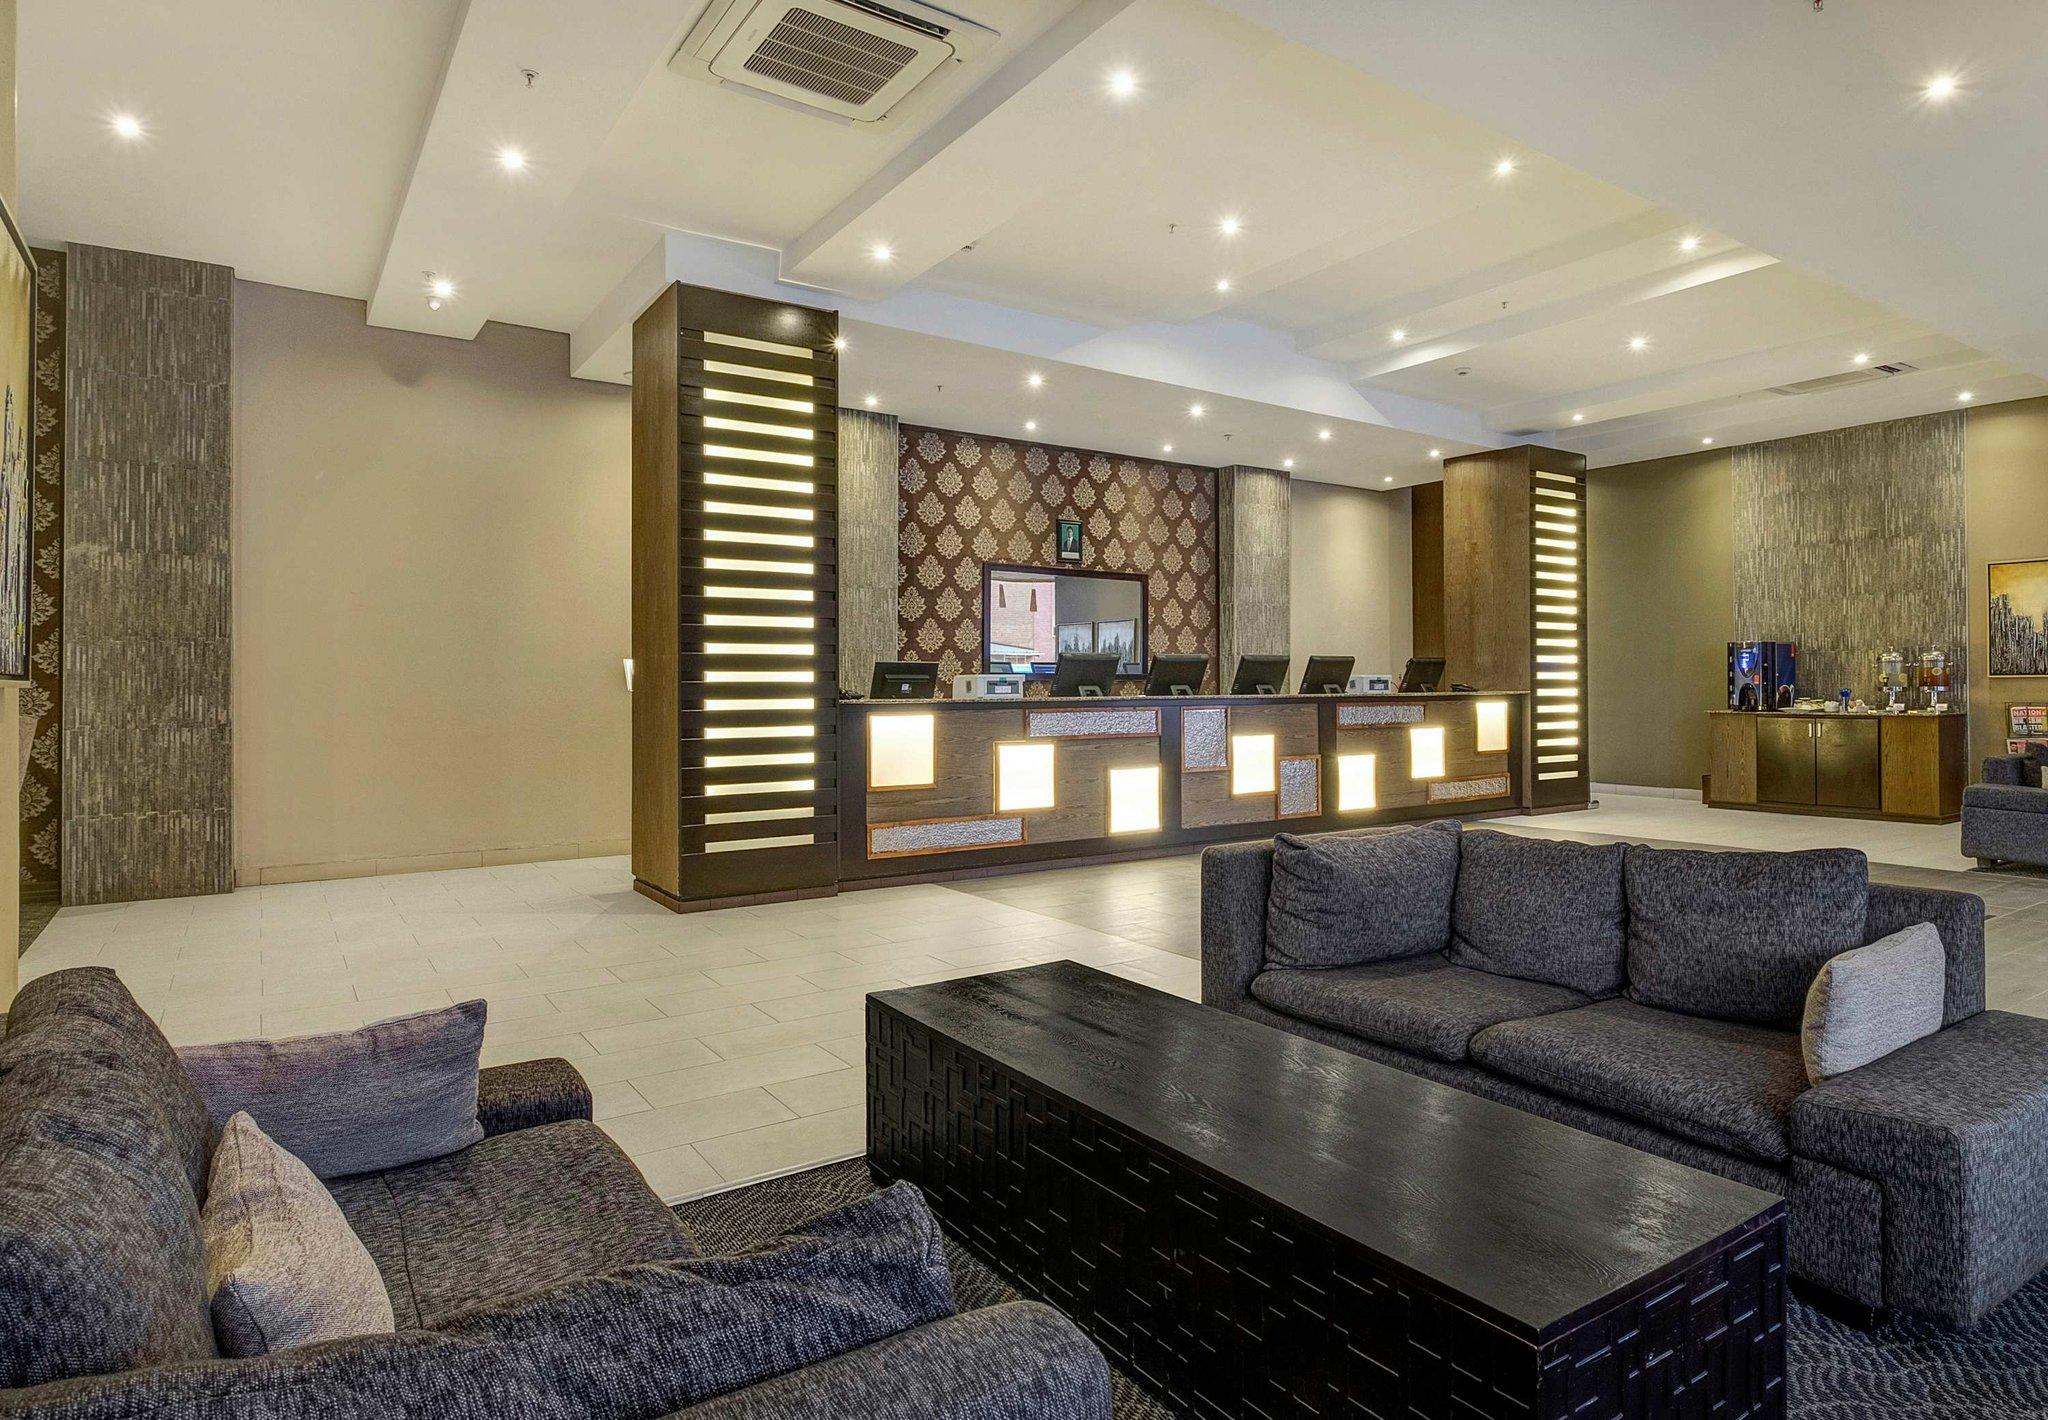 Lobby - Lounge